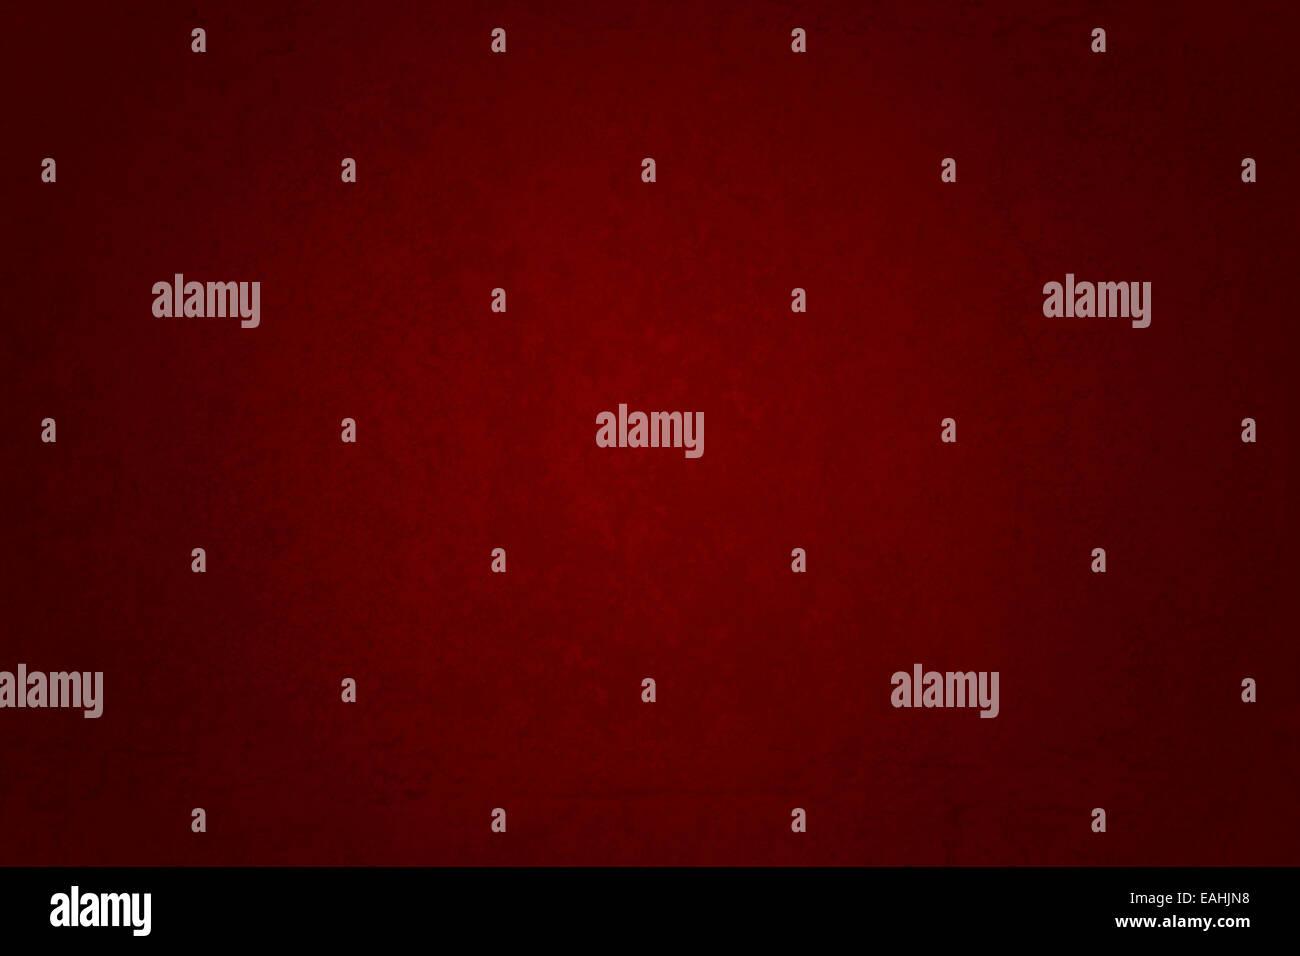 Red Paint Border Stockfotos & Red Paint Border Bilder - Seite 2 - Alamy